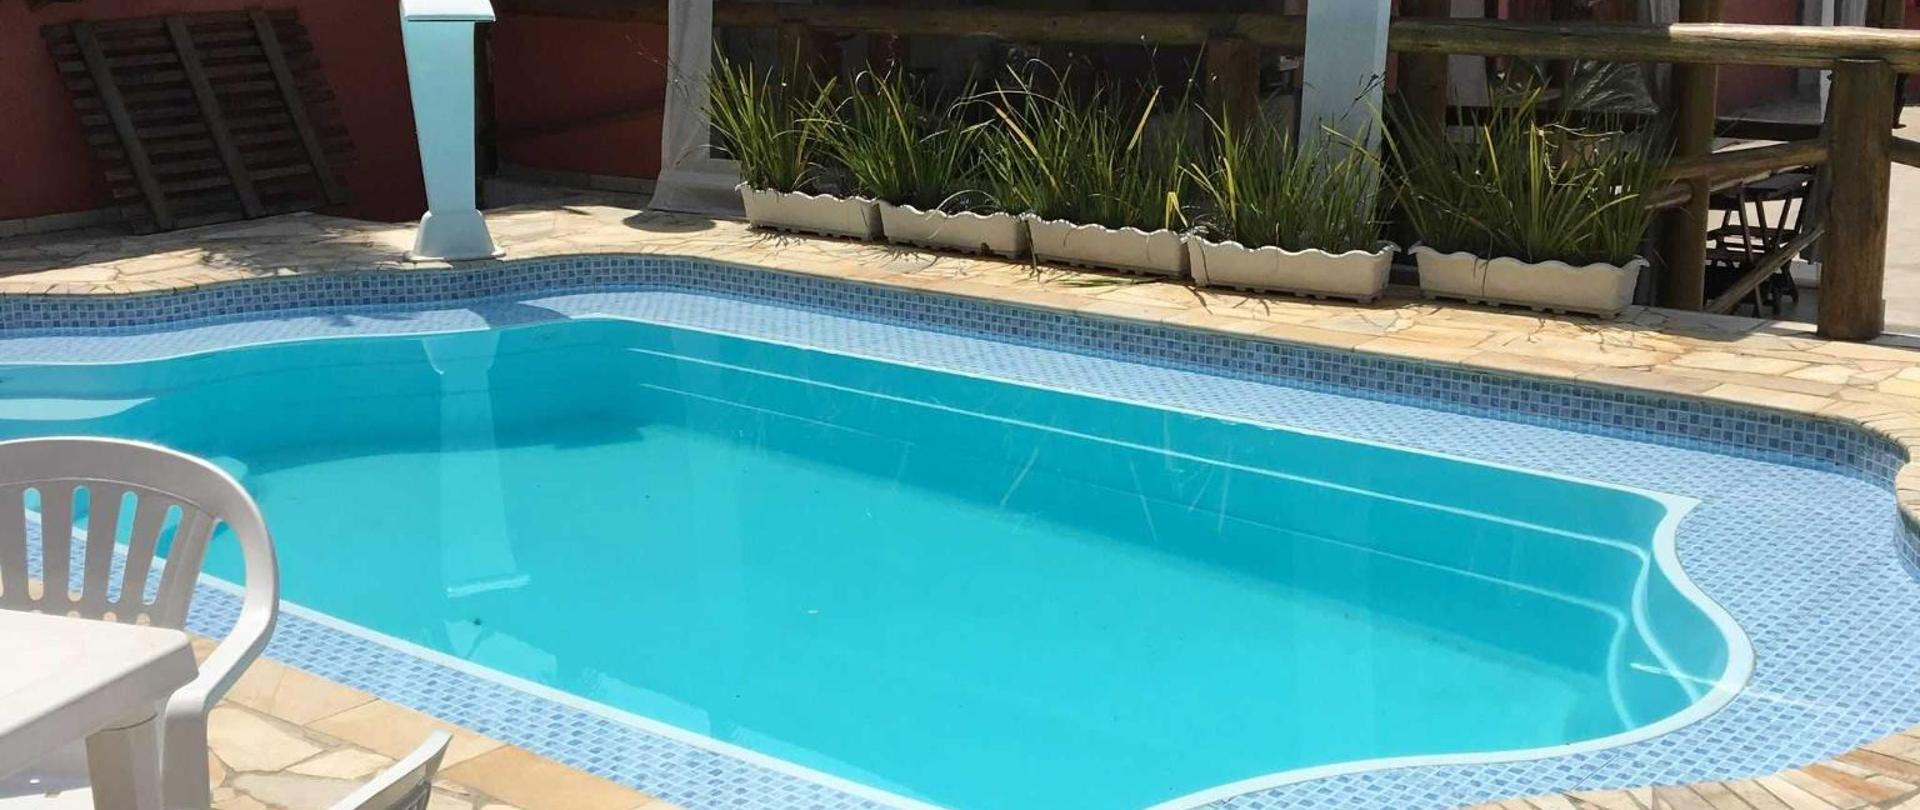 piscina-de-dia.JPG